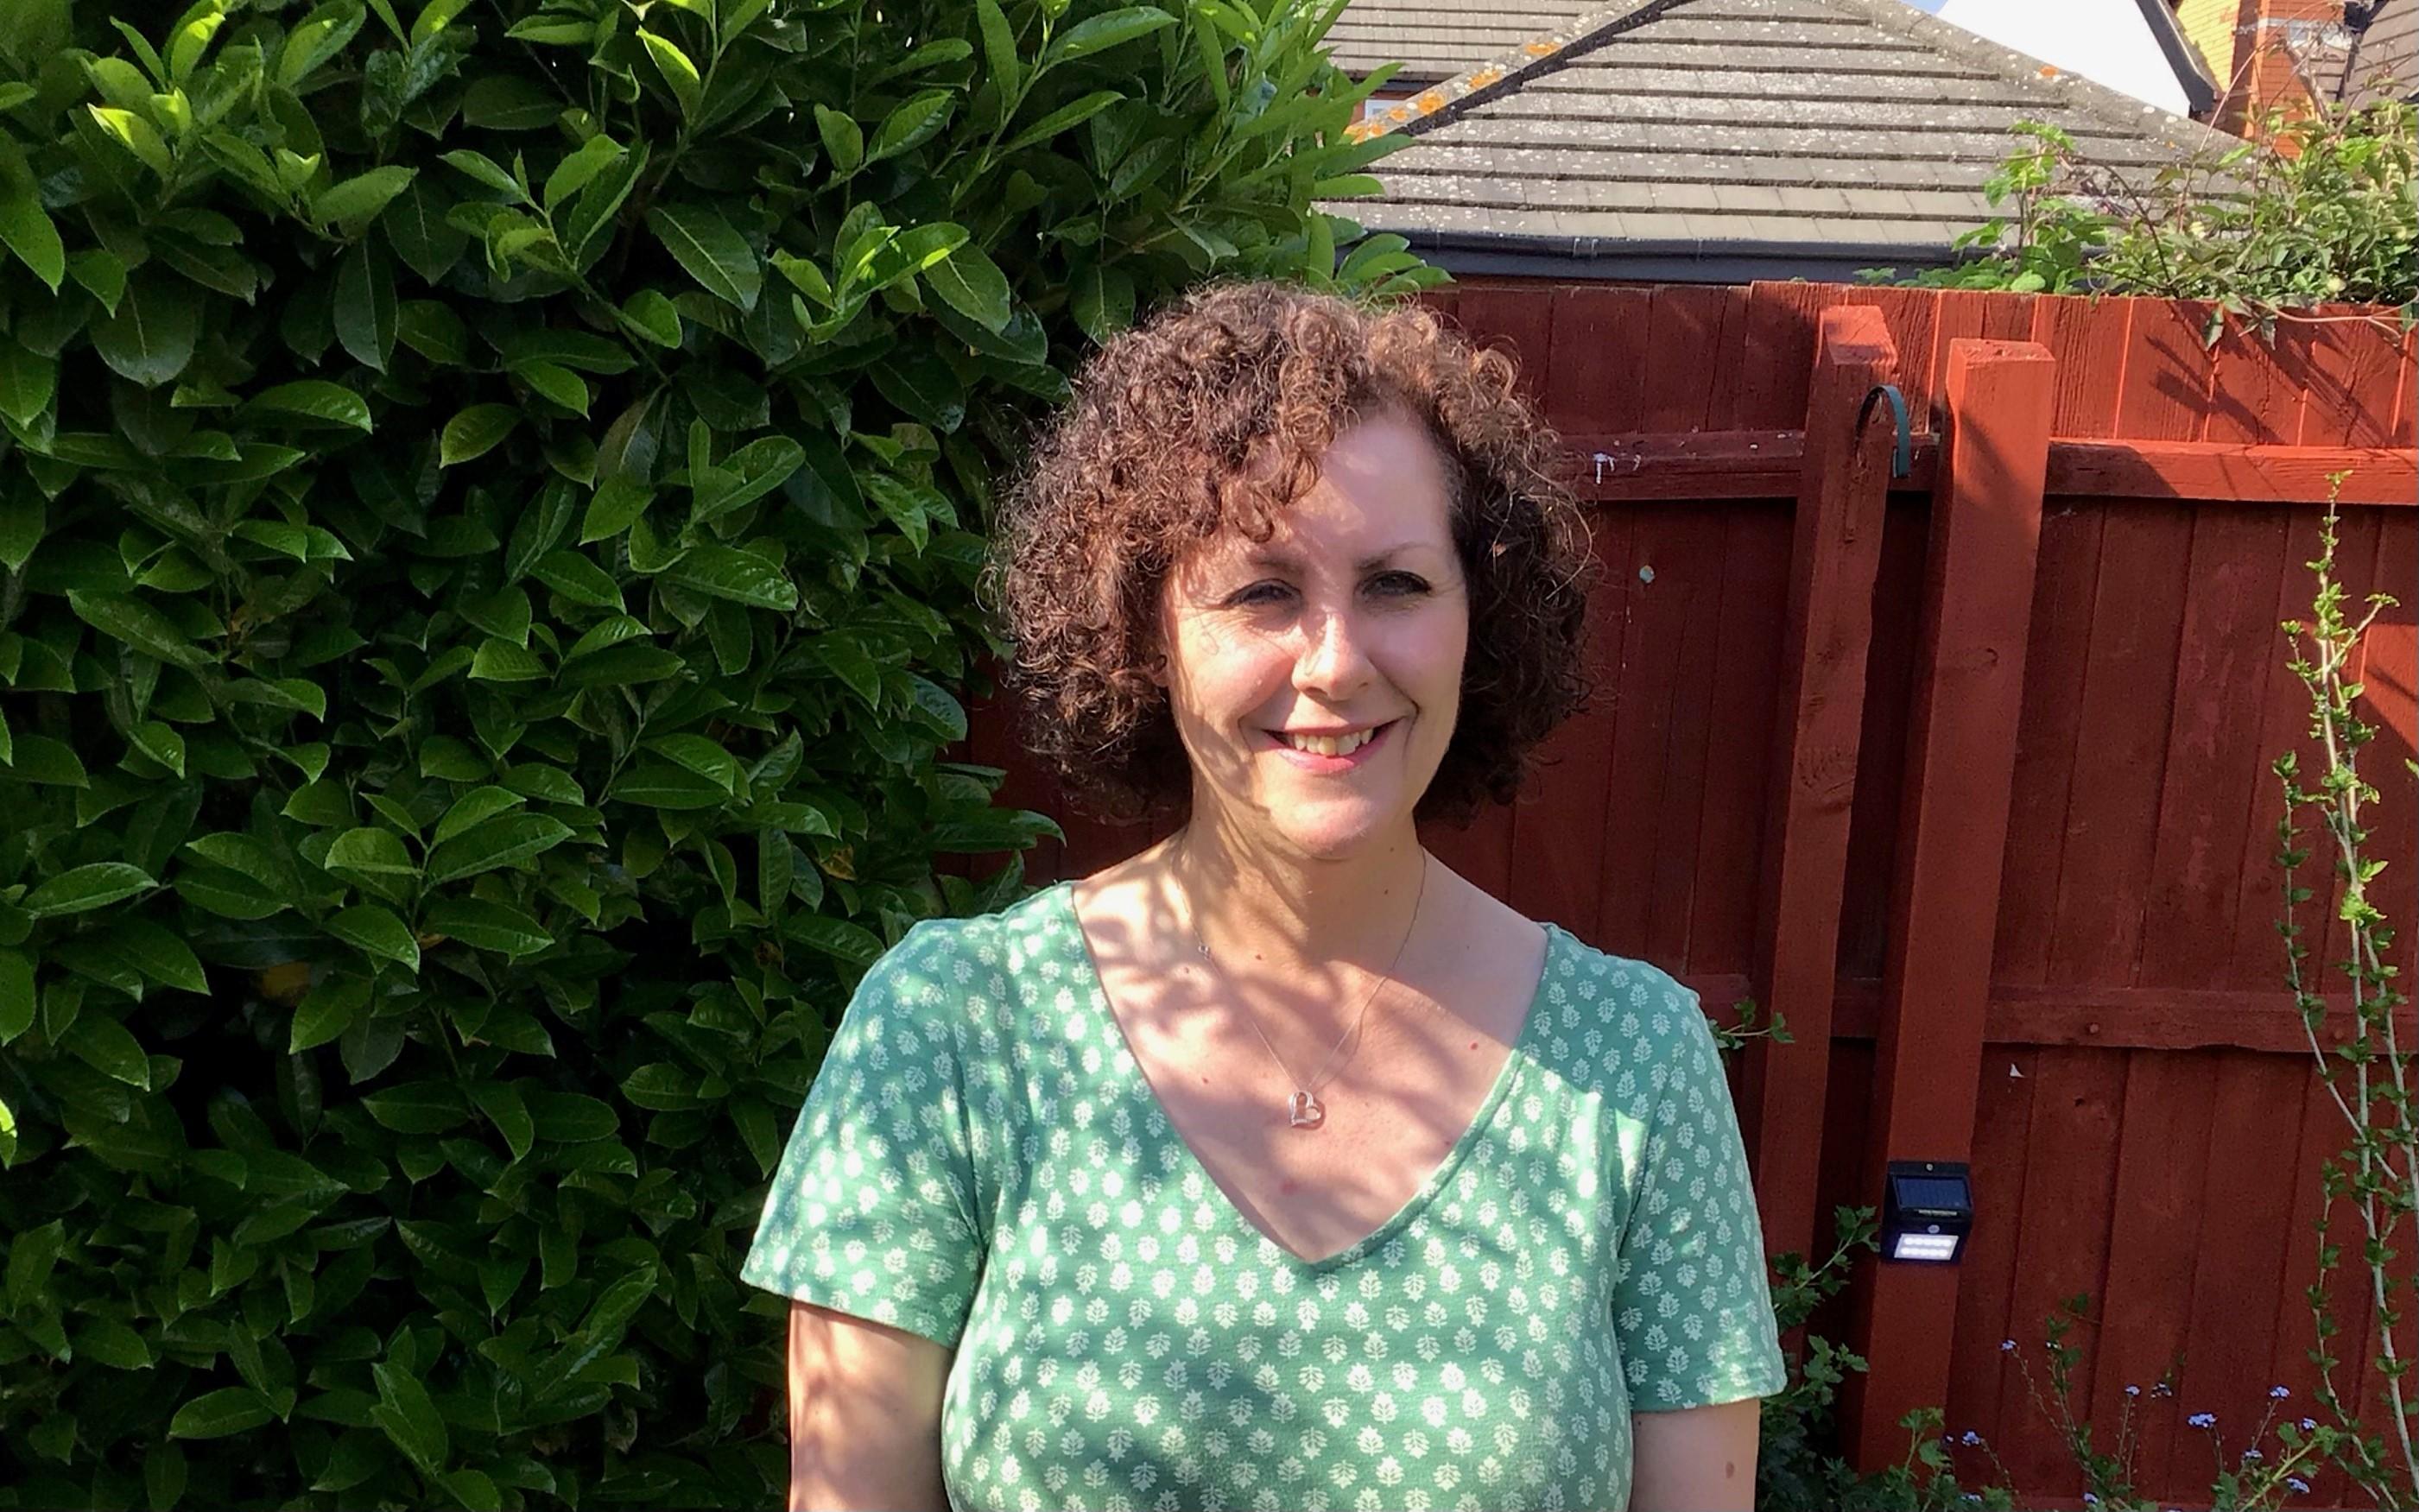 Janet Barton, 62 from Cambridge